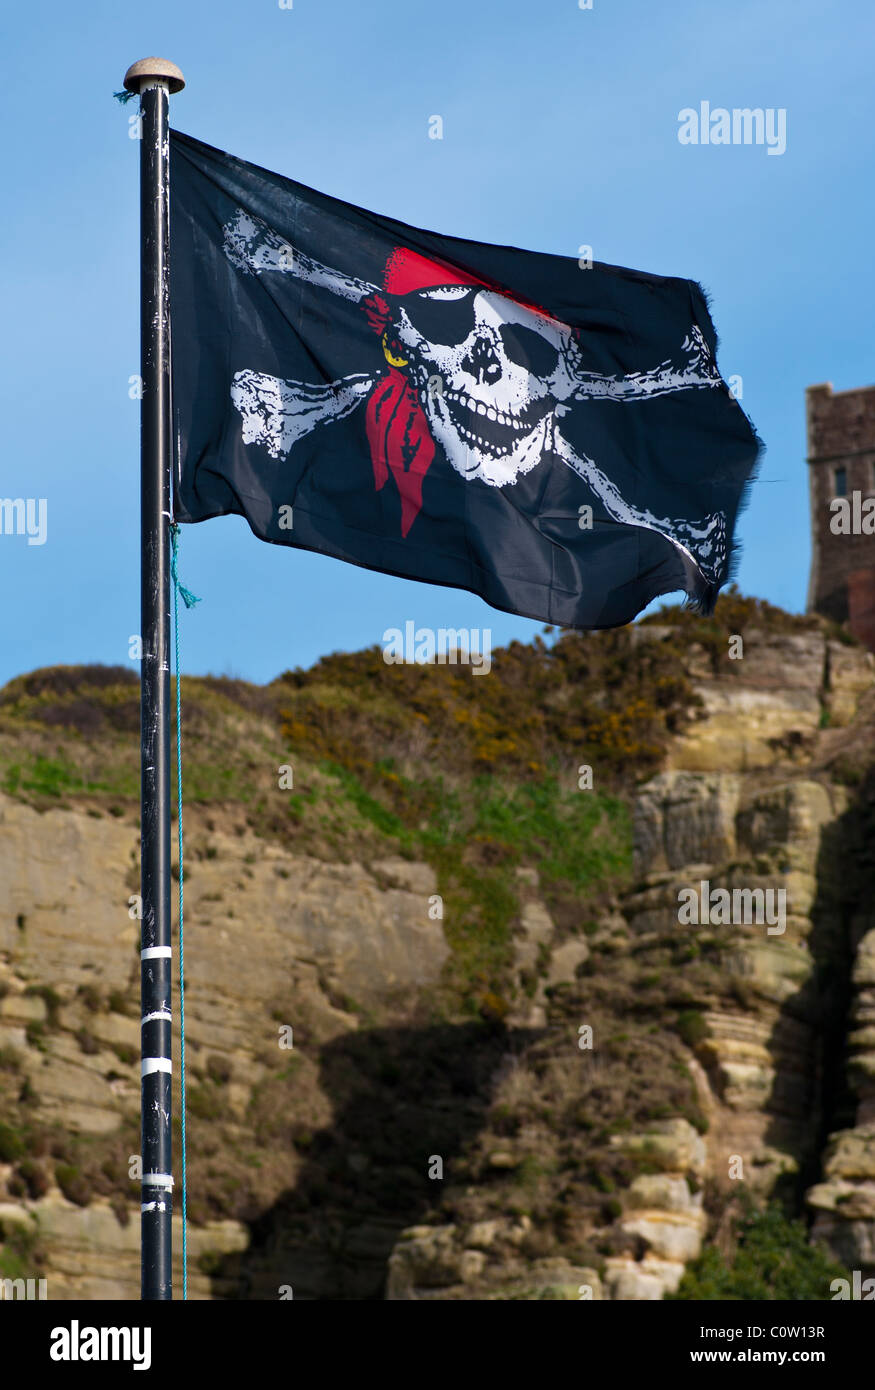 Jolly Roger Skull and Crossbones Flag - Stock Image